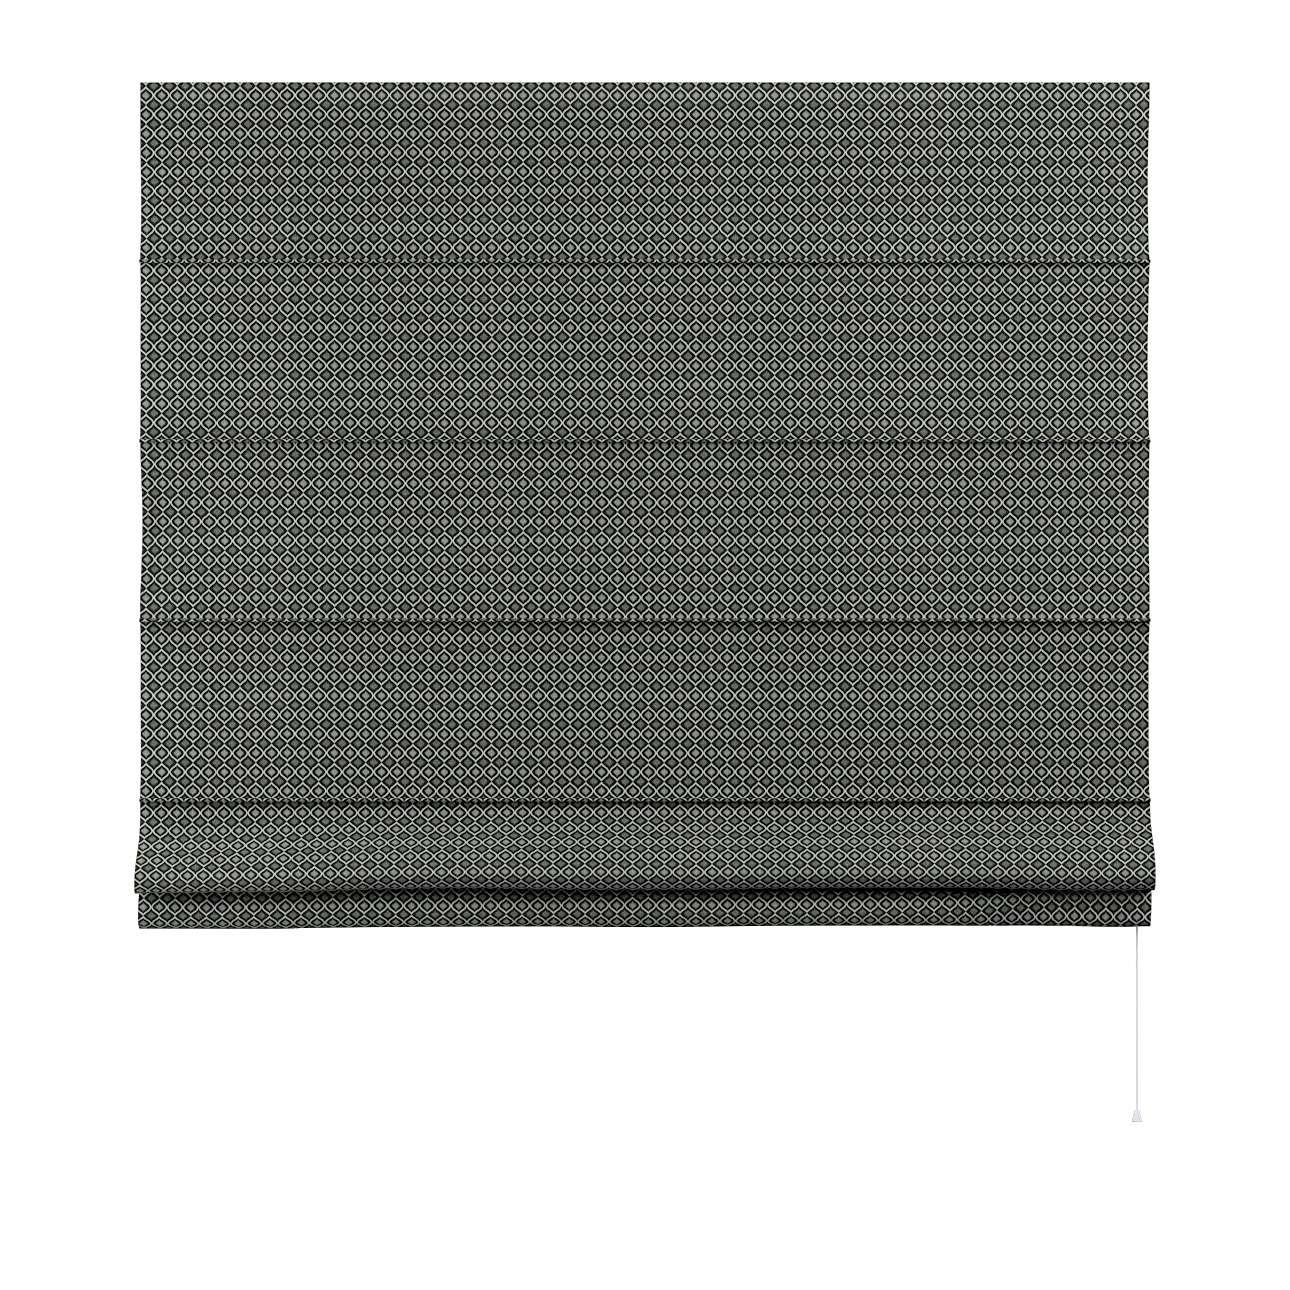 Capri roman blind in collection Black & White, fabric: 142-86